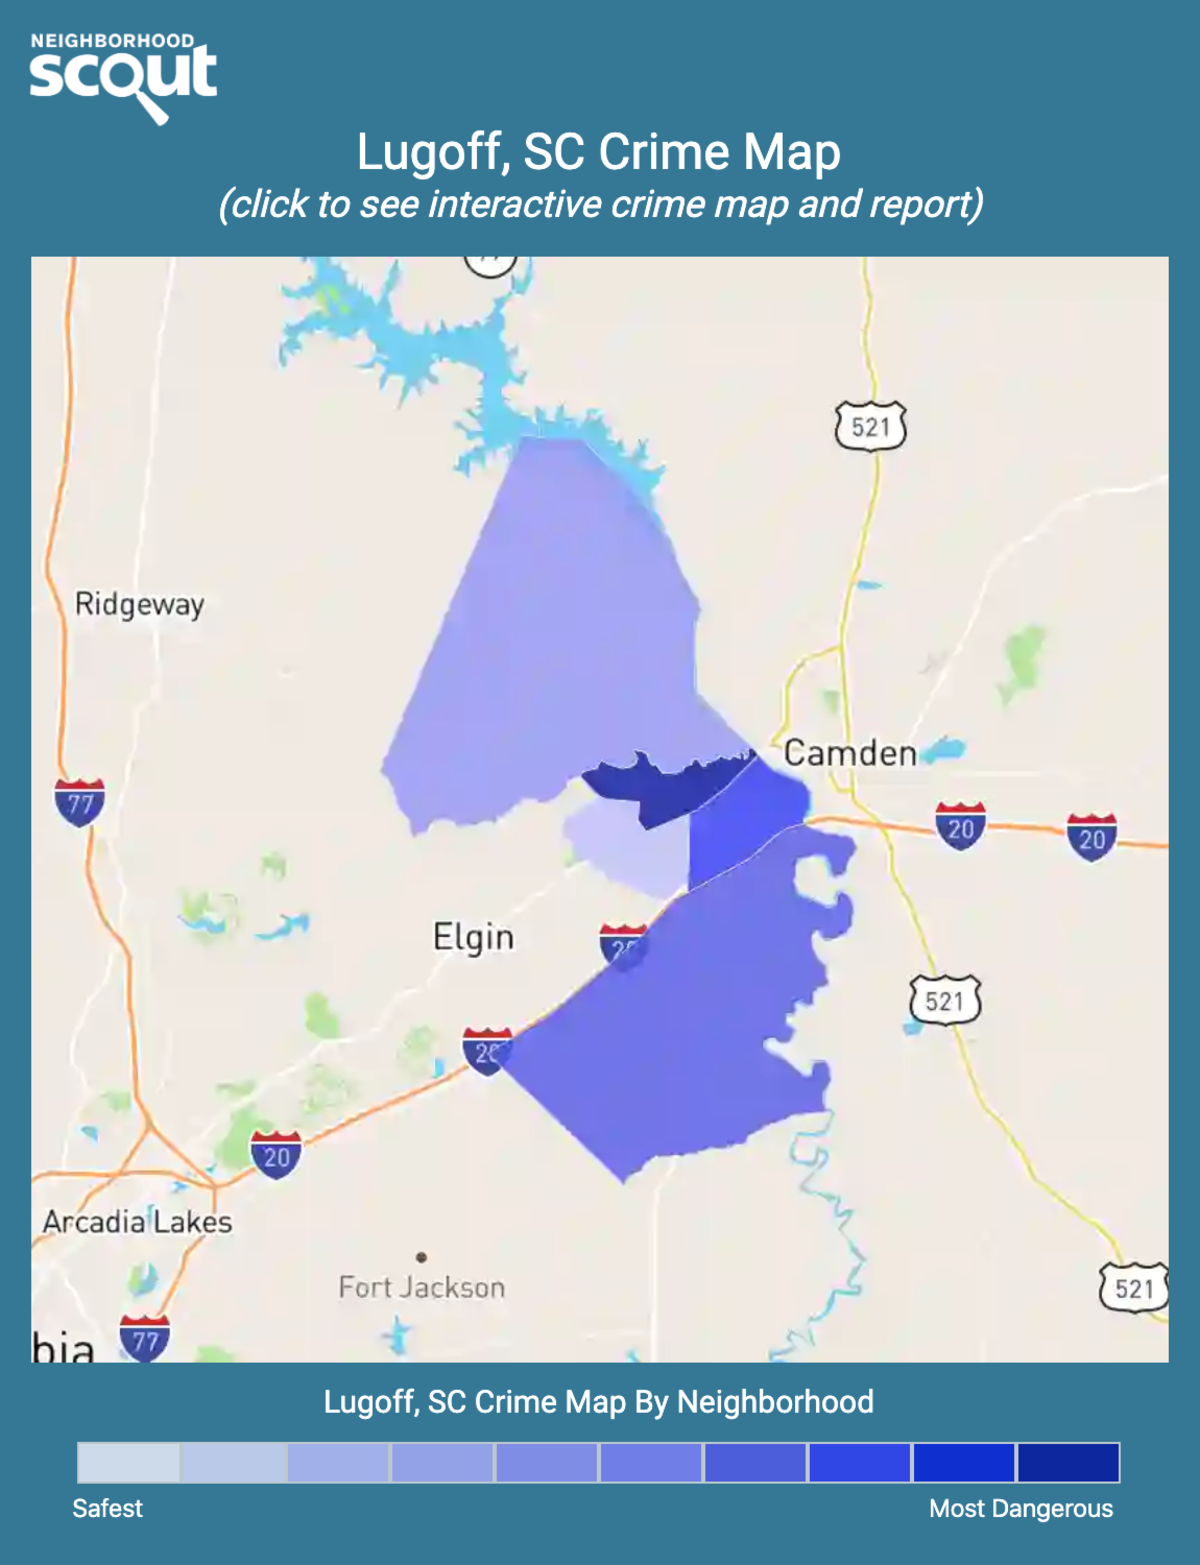 Lugoff, South Carolina crime map